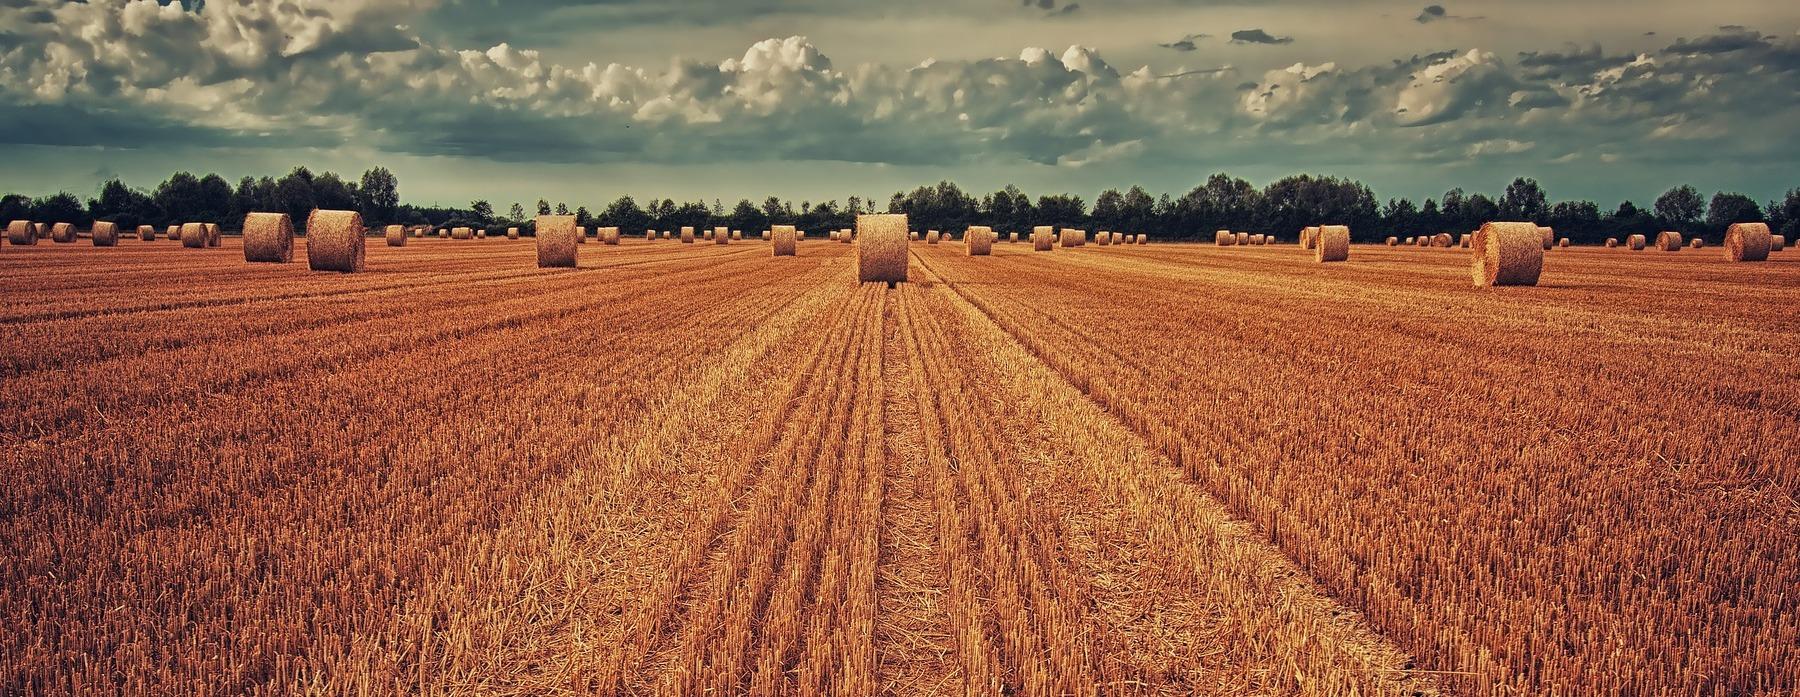 Smolensker Unternehmen exportiert Landmaschinen nach Polen